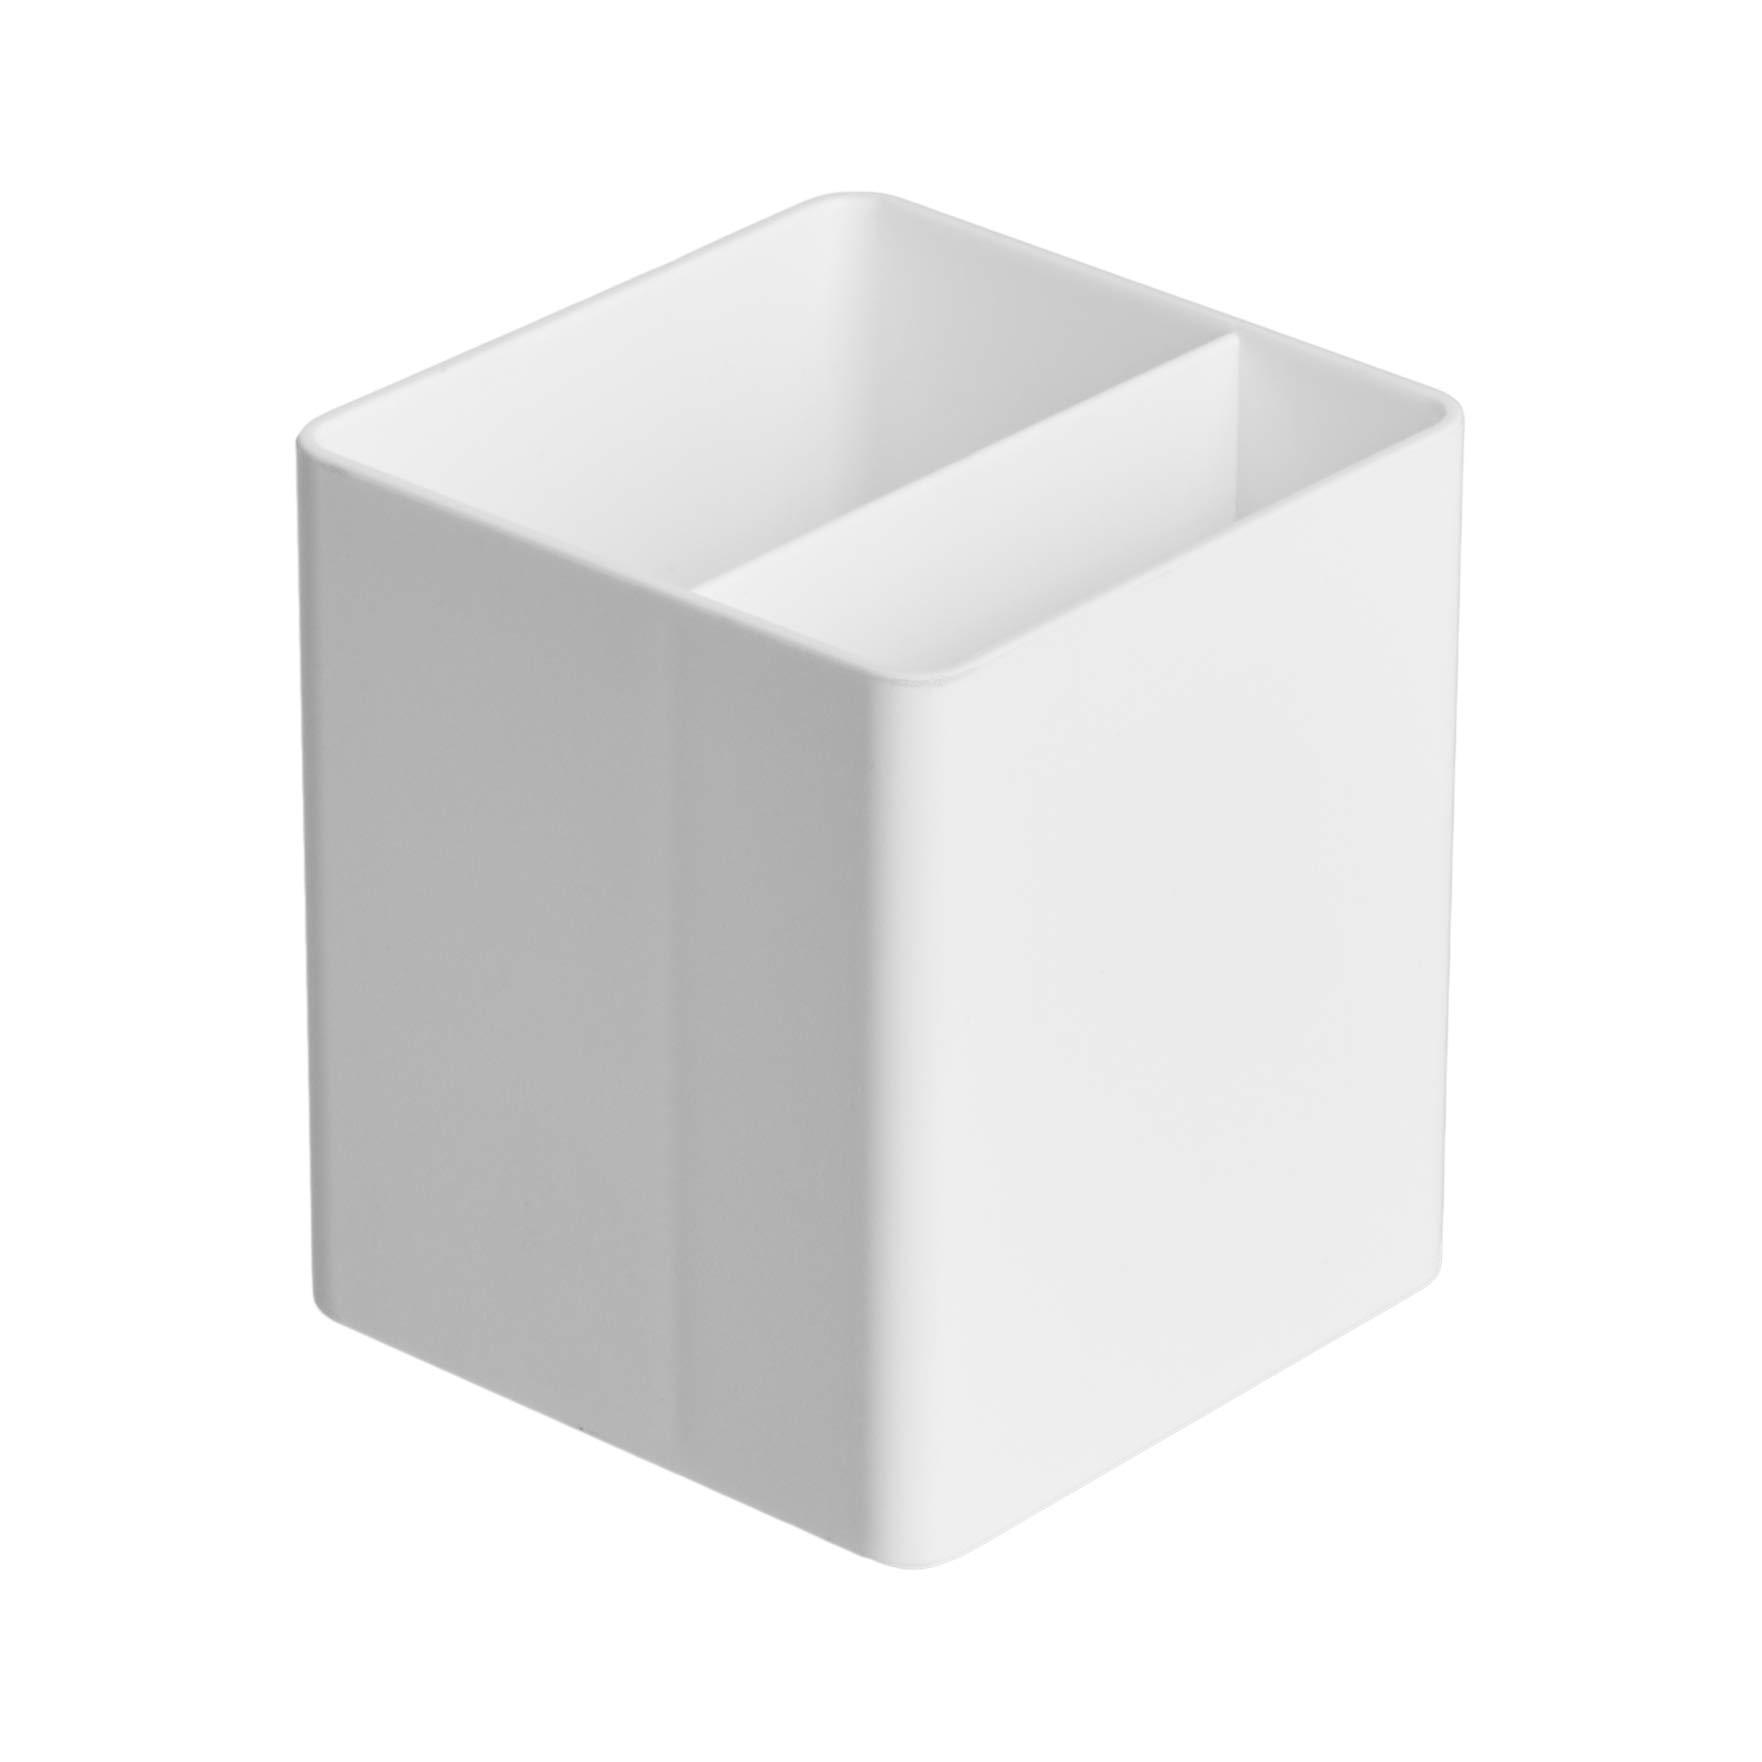 AmazonBasics Plastic Desk Organizer - Pen Cup, White